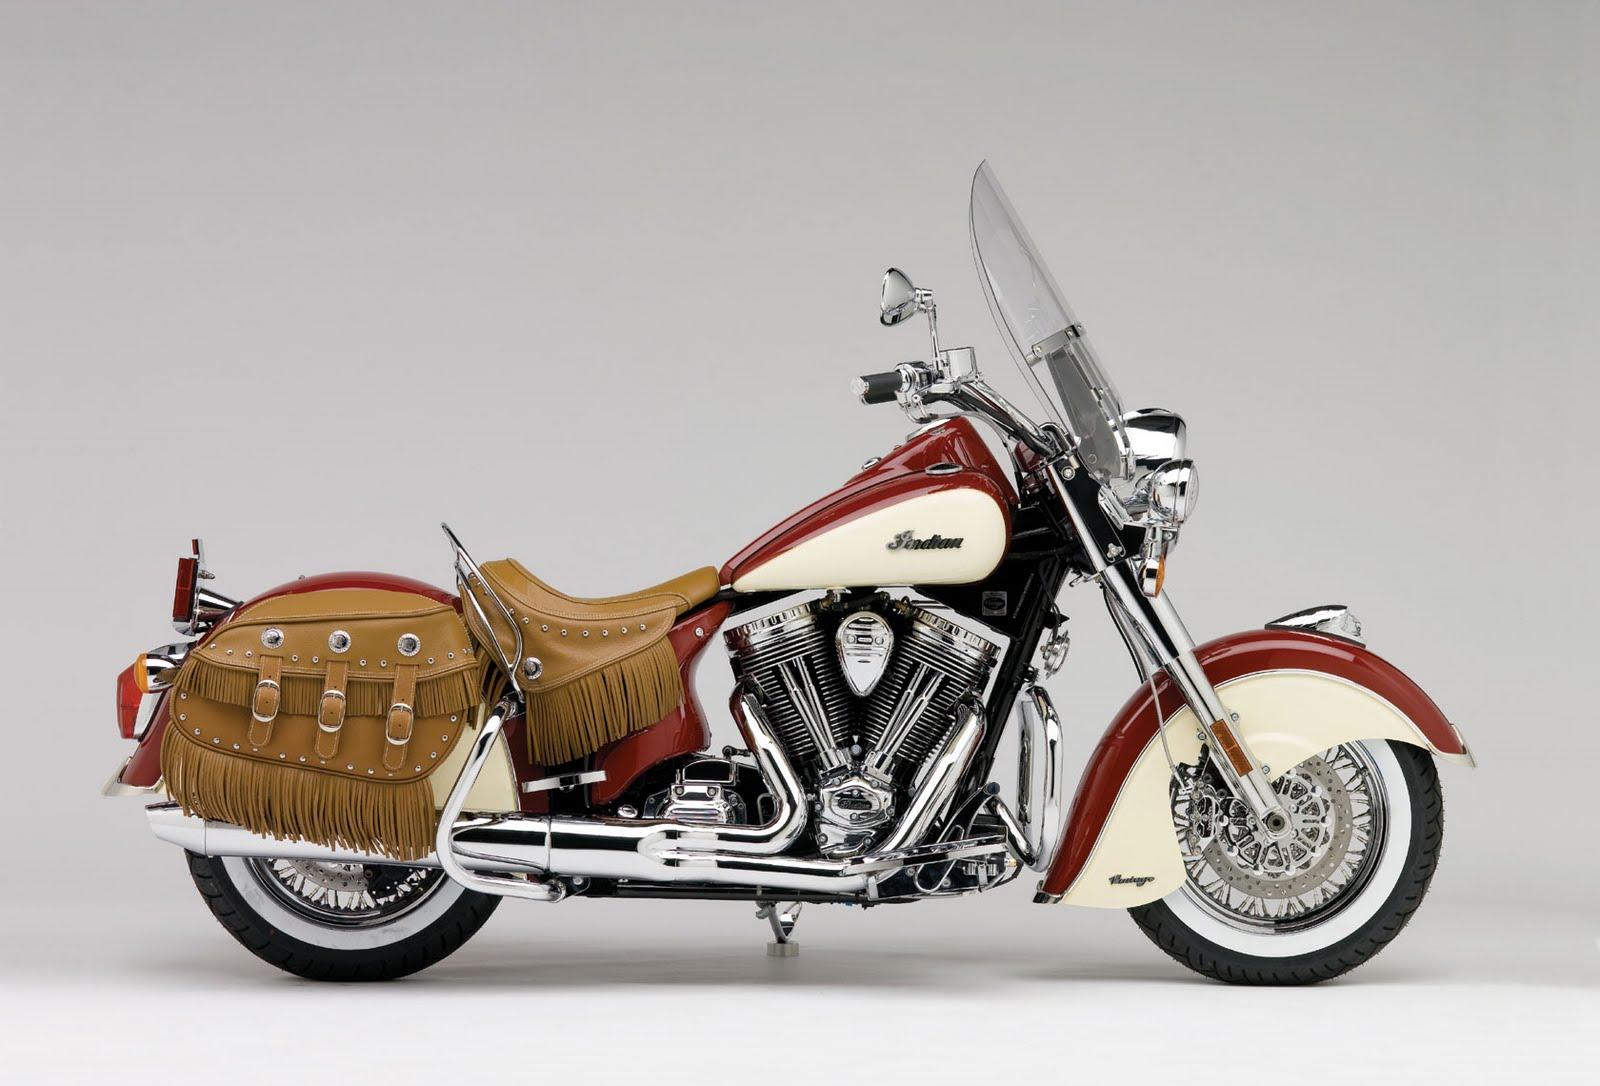 top motorcycle 2009 indian chief vintage. Black Bedroom Furniture Sets. Home Design Ideas